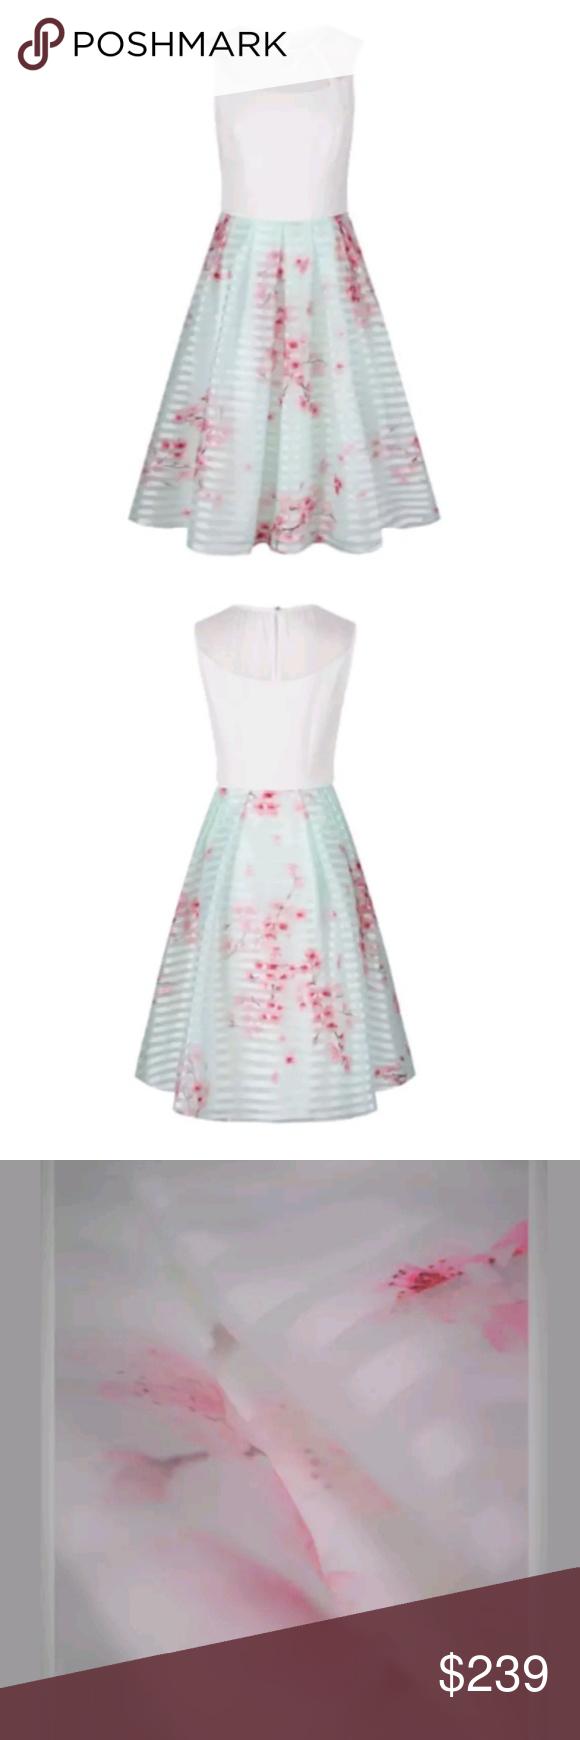 03220271f Ted Baker London Idola Soft Blossom Contrast Dress Ted Baker London Idola  Soft Blossom Contrast Dress